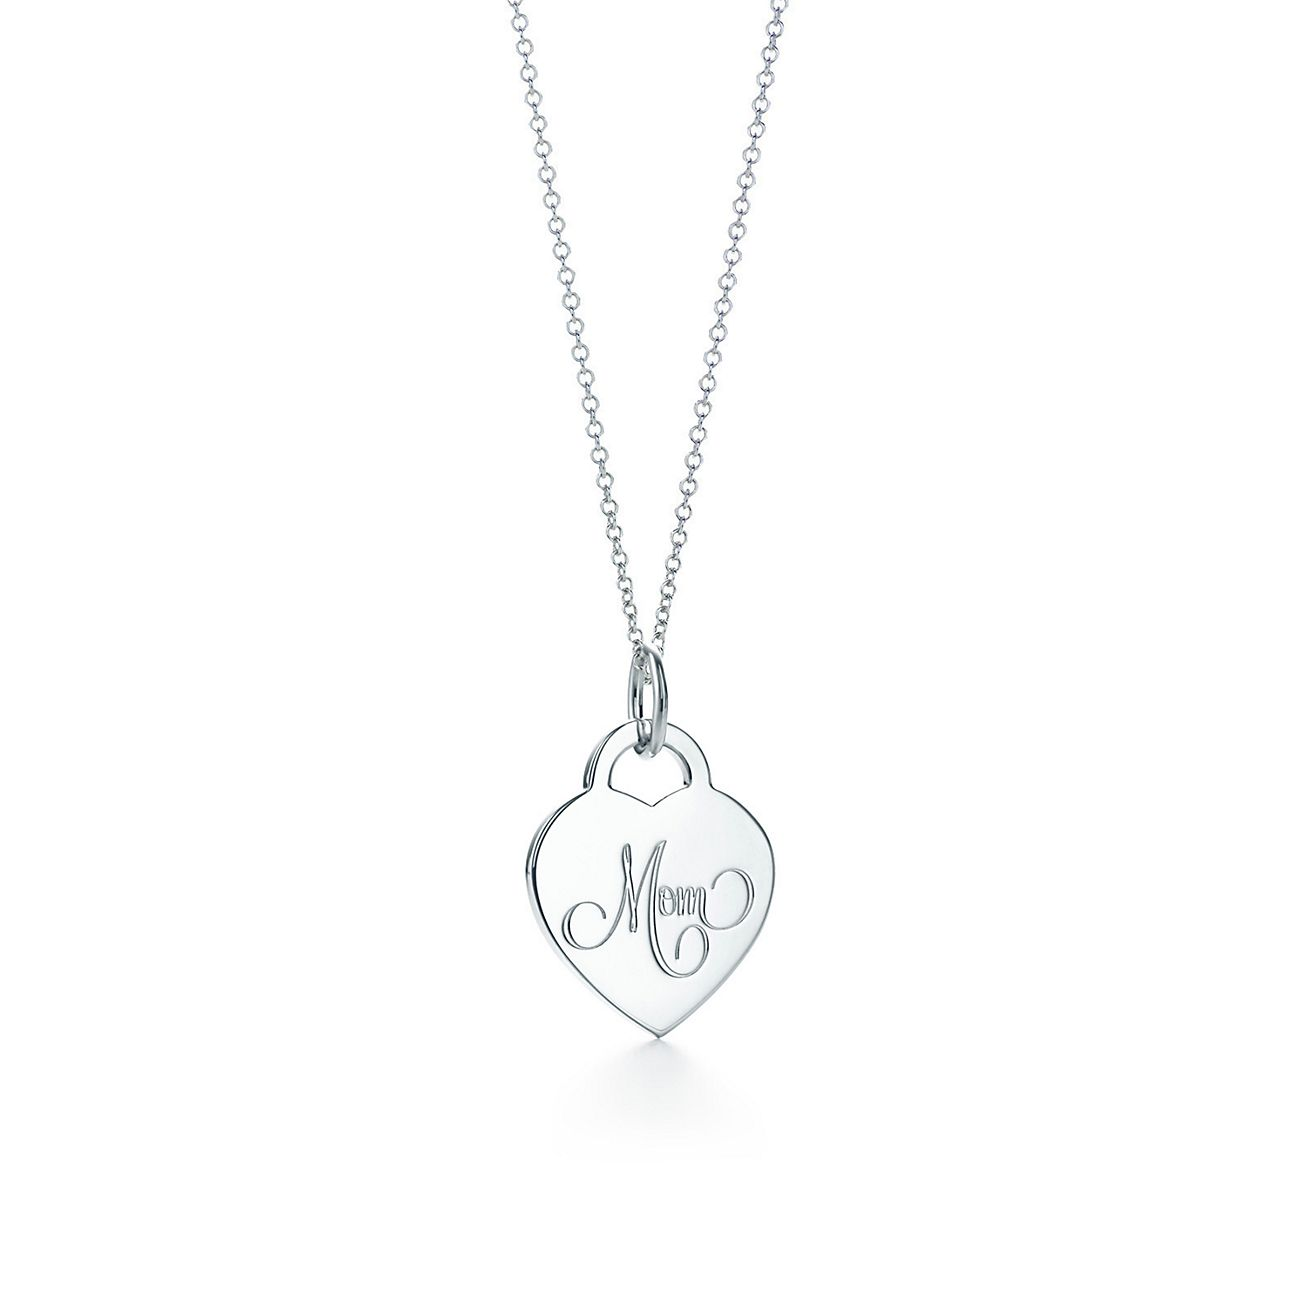 Sterling silver mom heart tag charm tiffany co mom heart tag charm and chain aloadofball Image collections